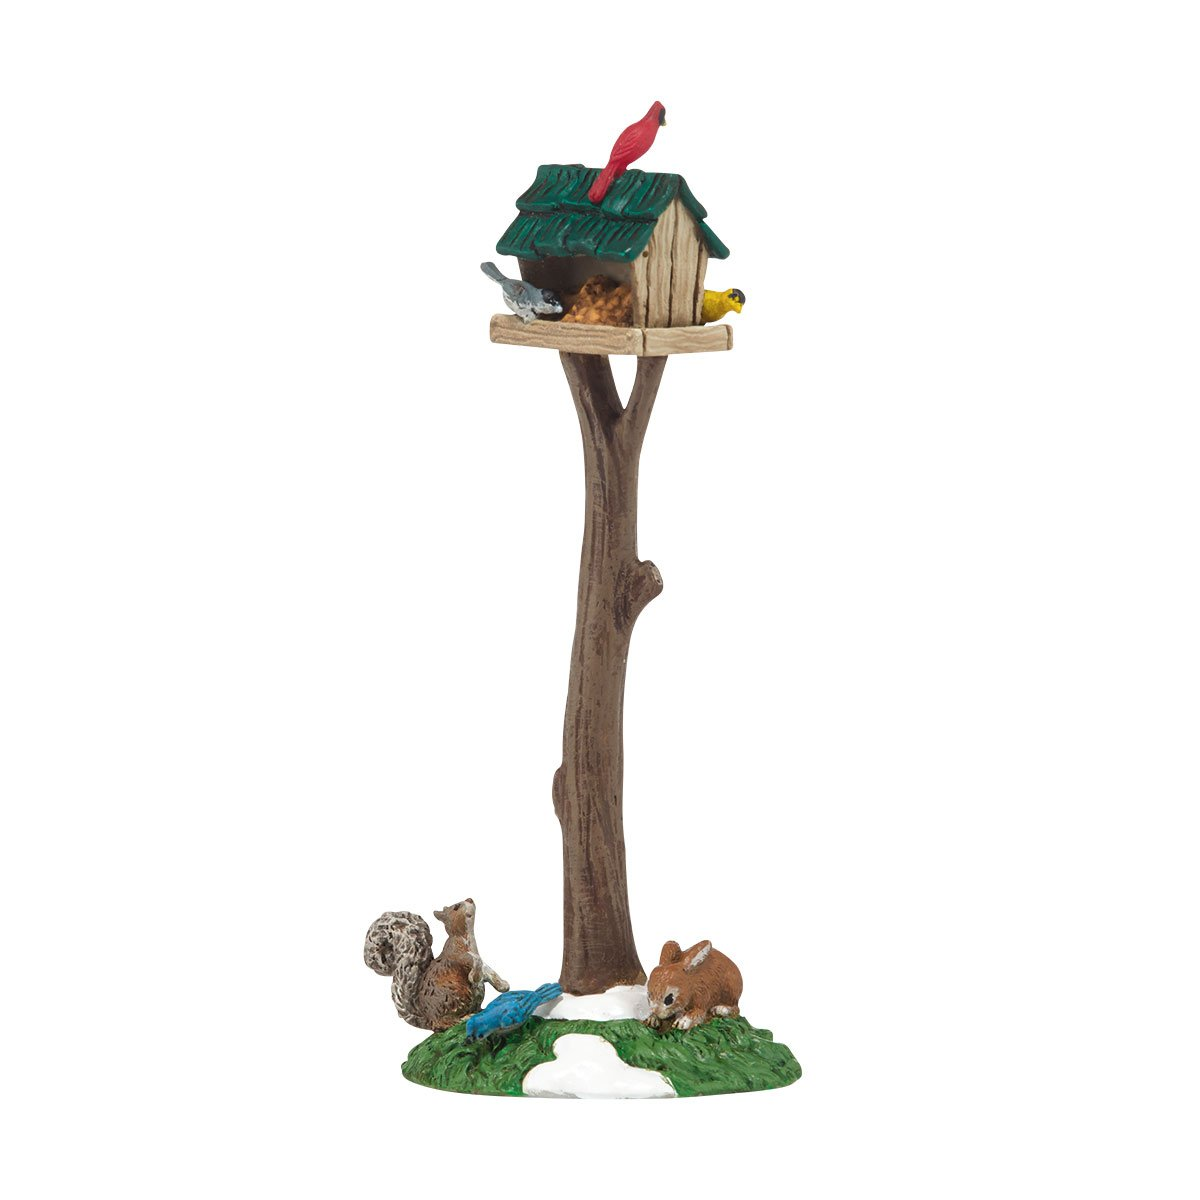 Department 56 Accessories for Villages Woodland Bird Feeder Accessory, 1.73 inch